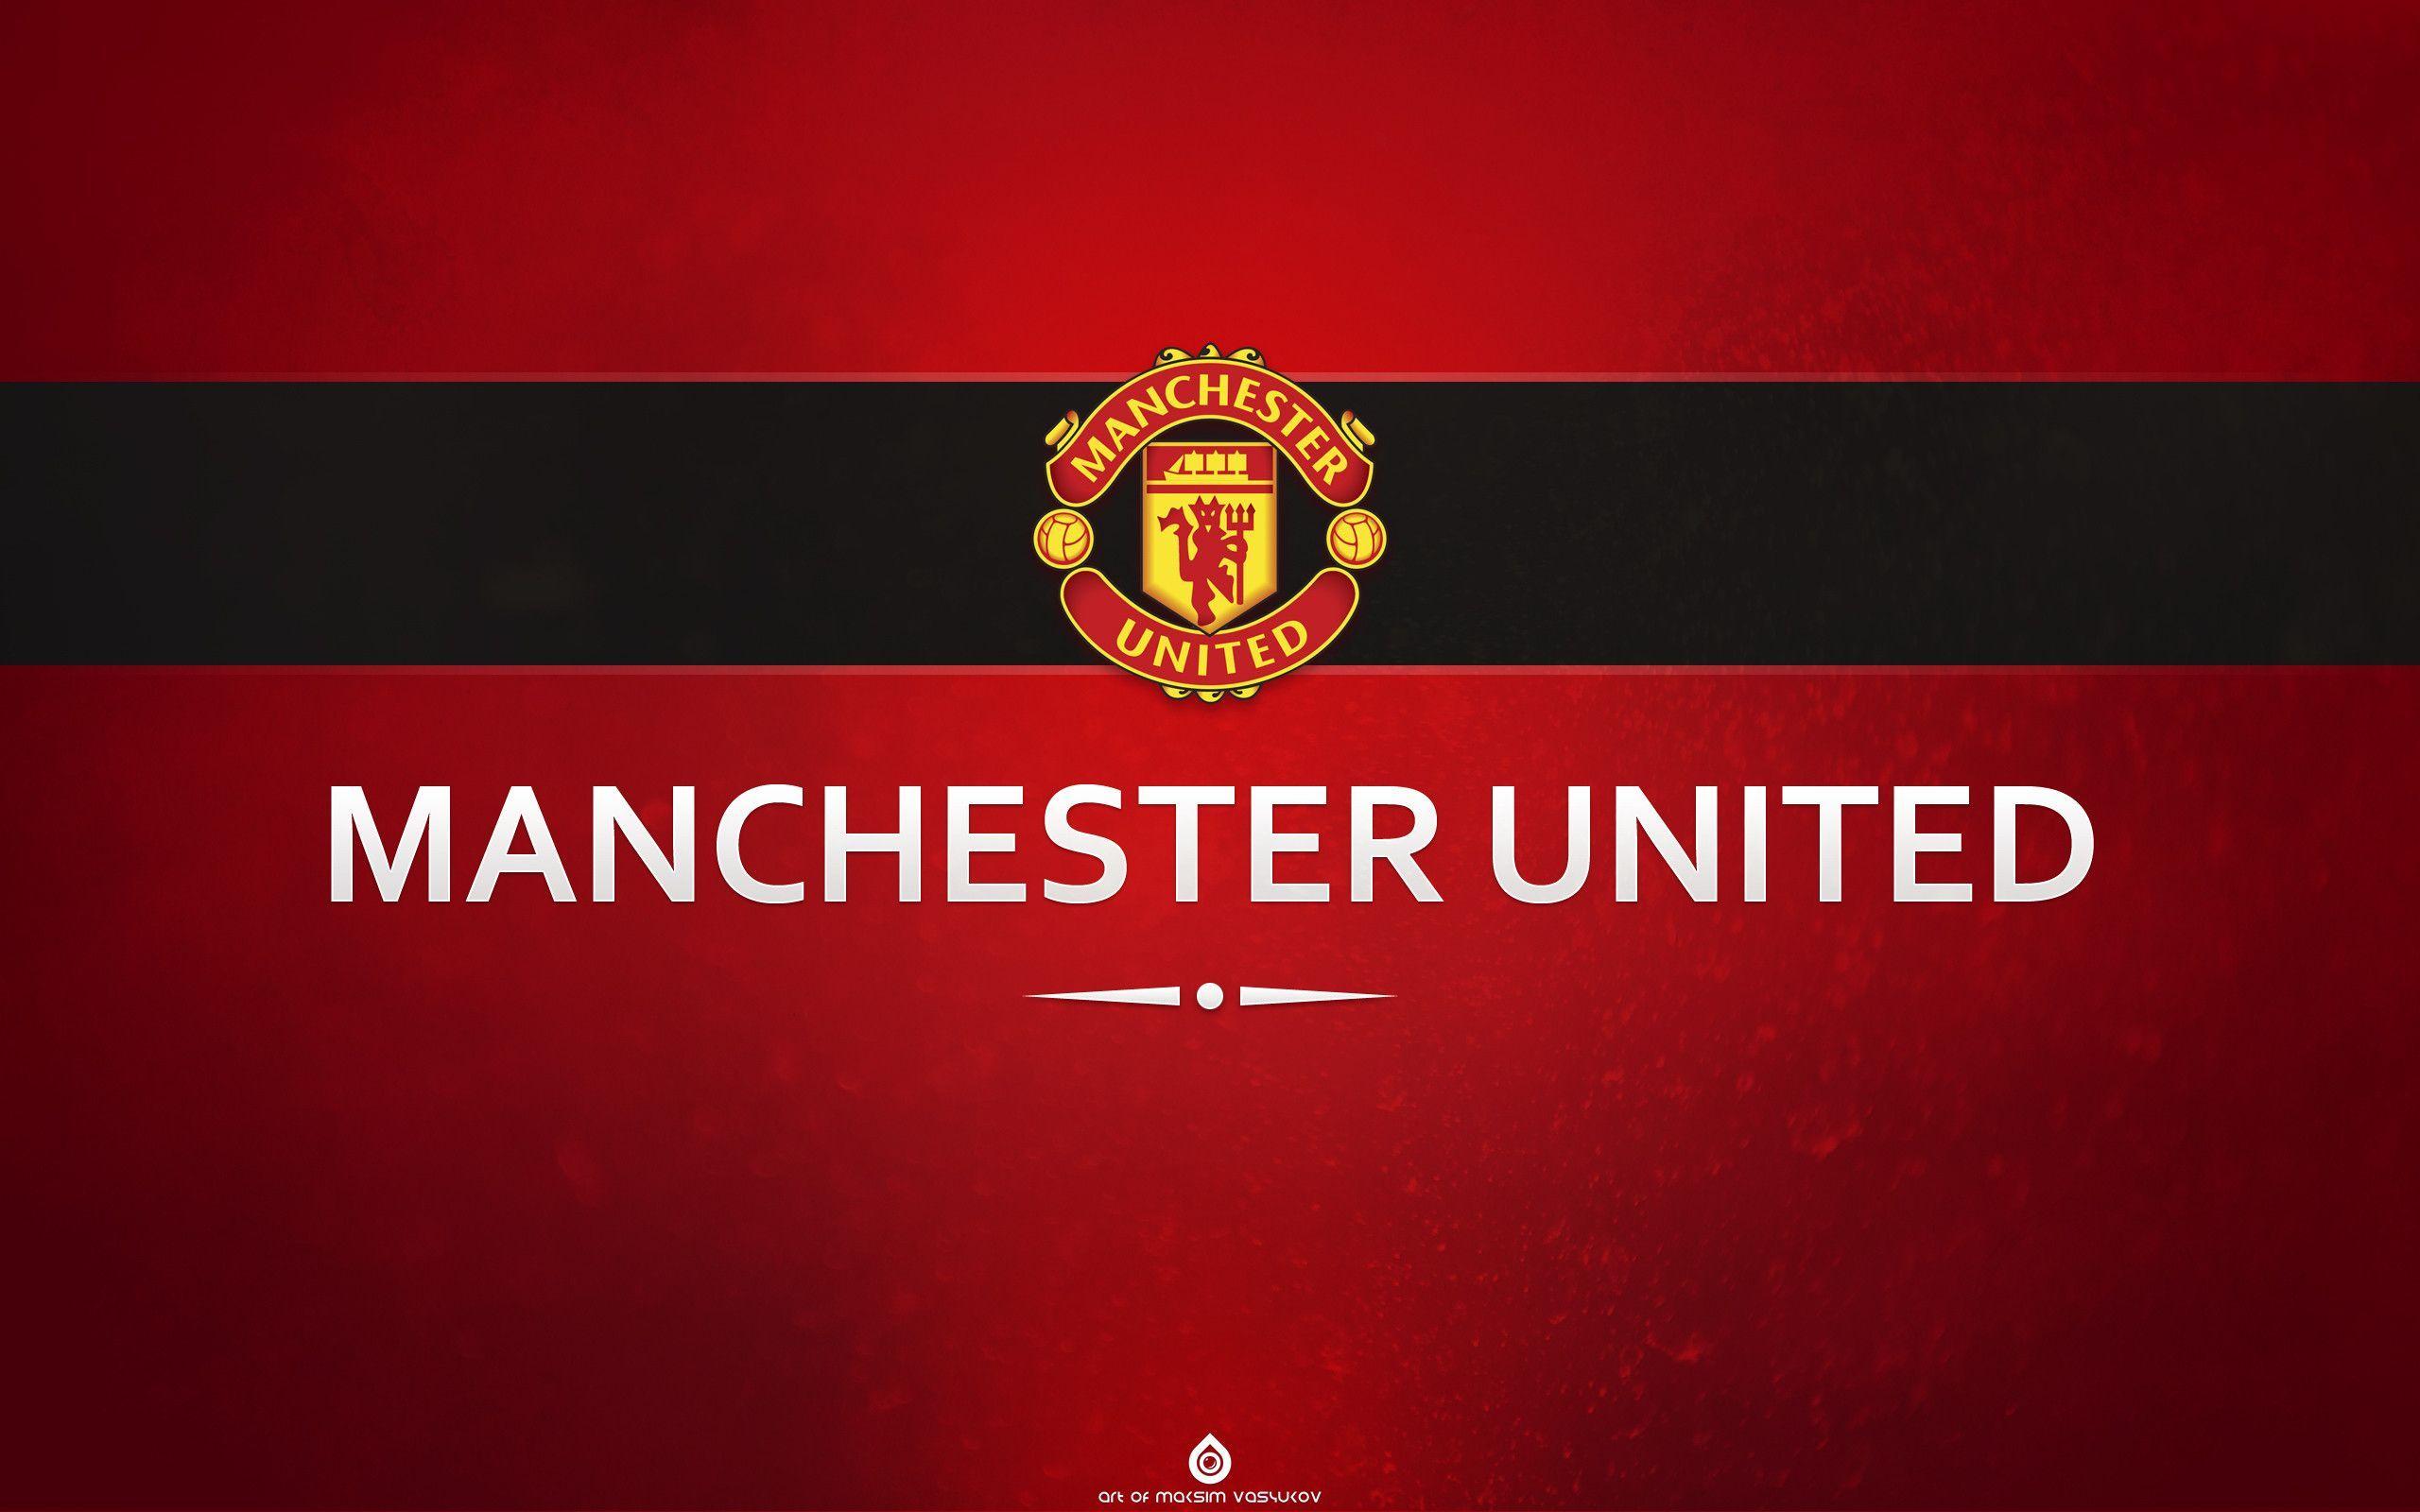 Manchester united logo wallpapers wallpaper cave for Man u bedroom wallpaper